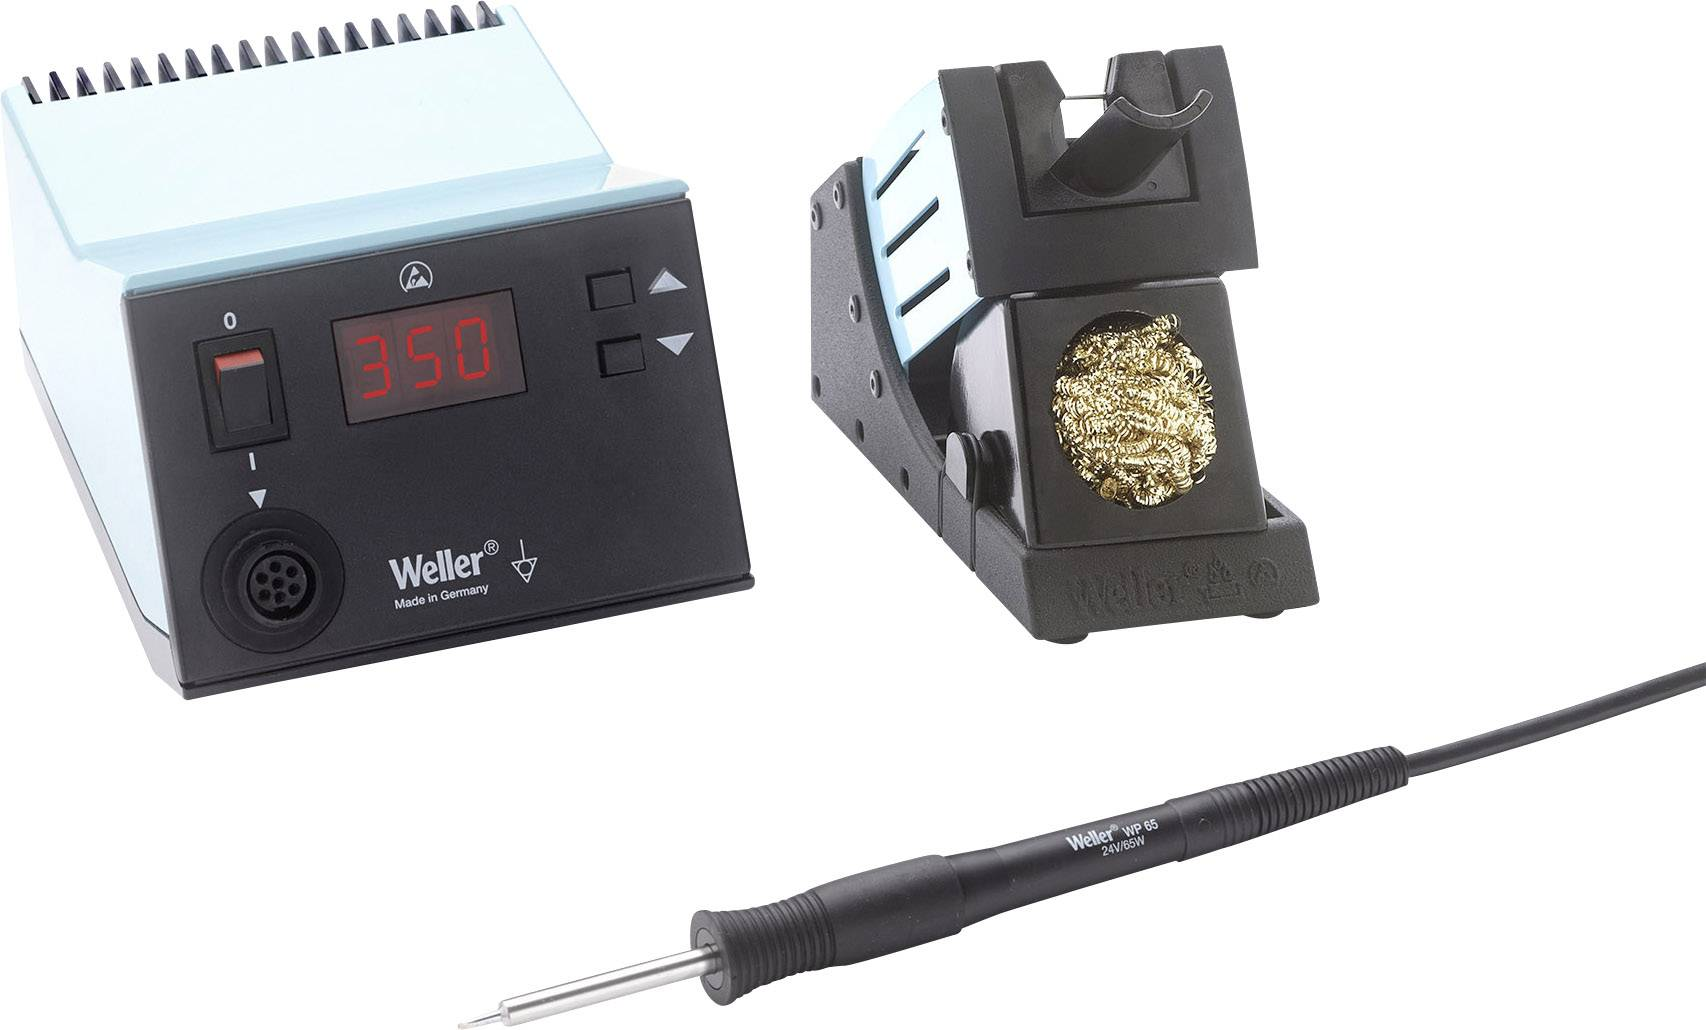 Digitálne spájkovacia stanice Weller WSD 81i SE, 95 W, +50 až +450 °C, spájkovacie pero WP 65